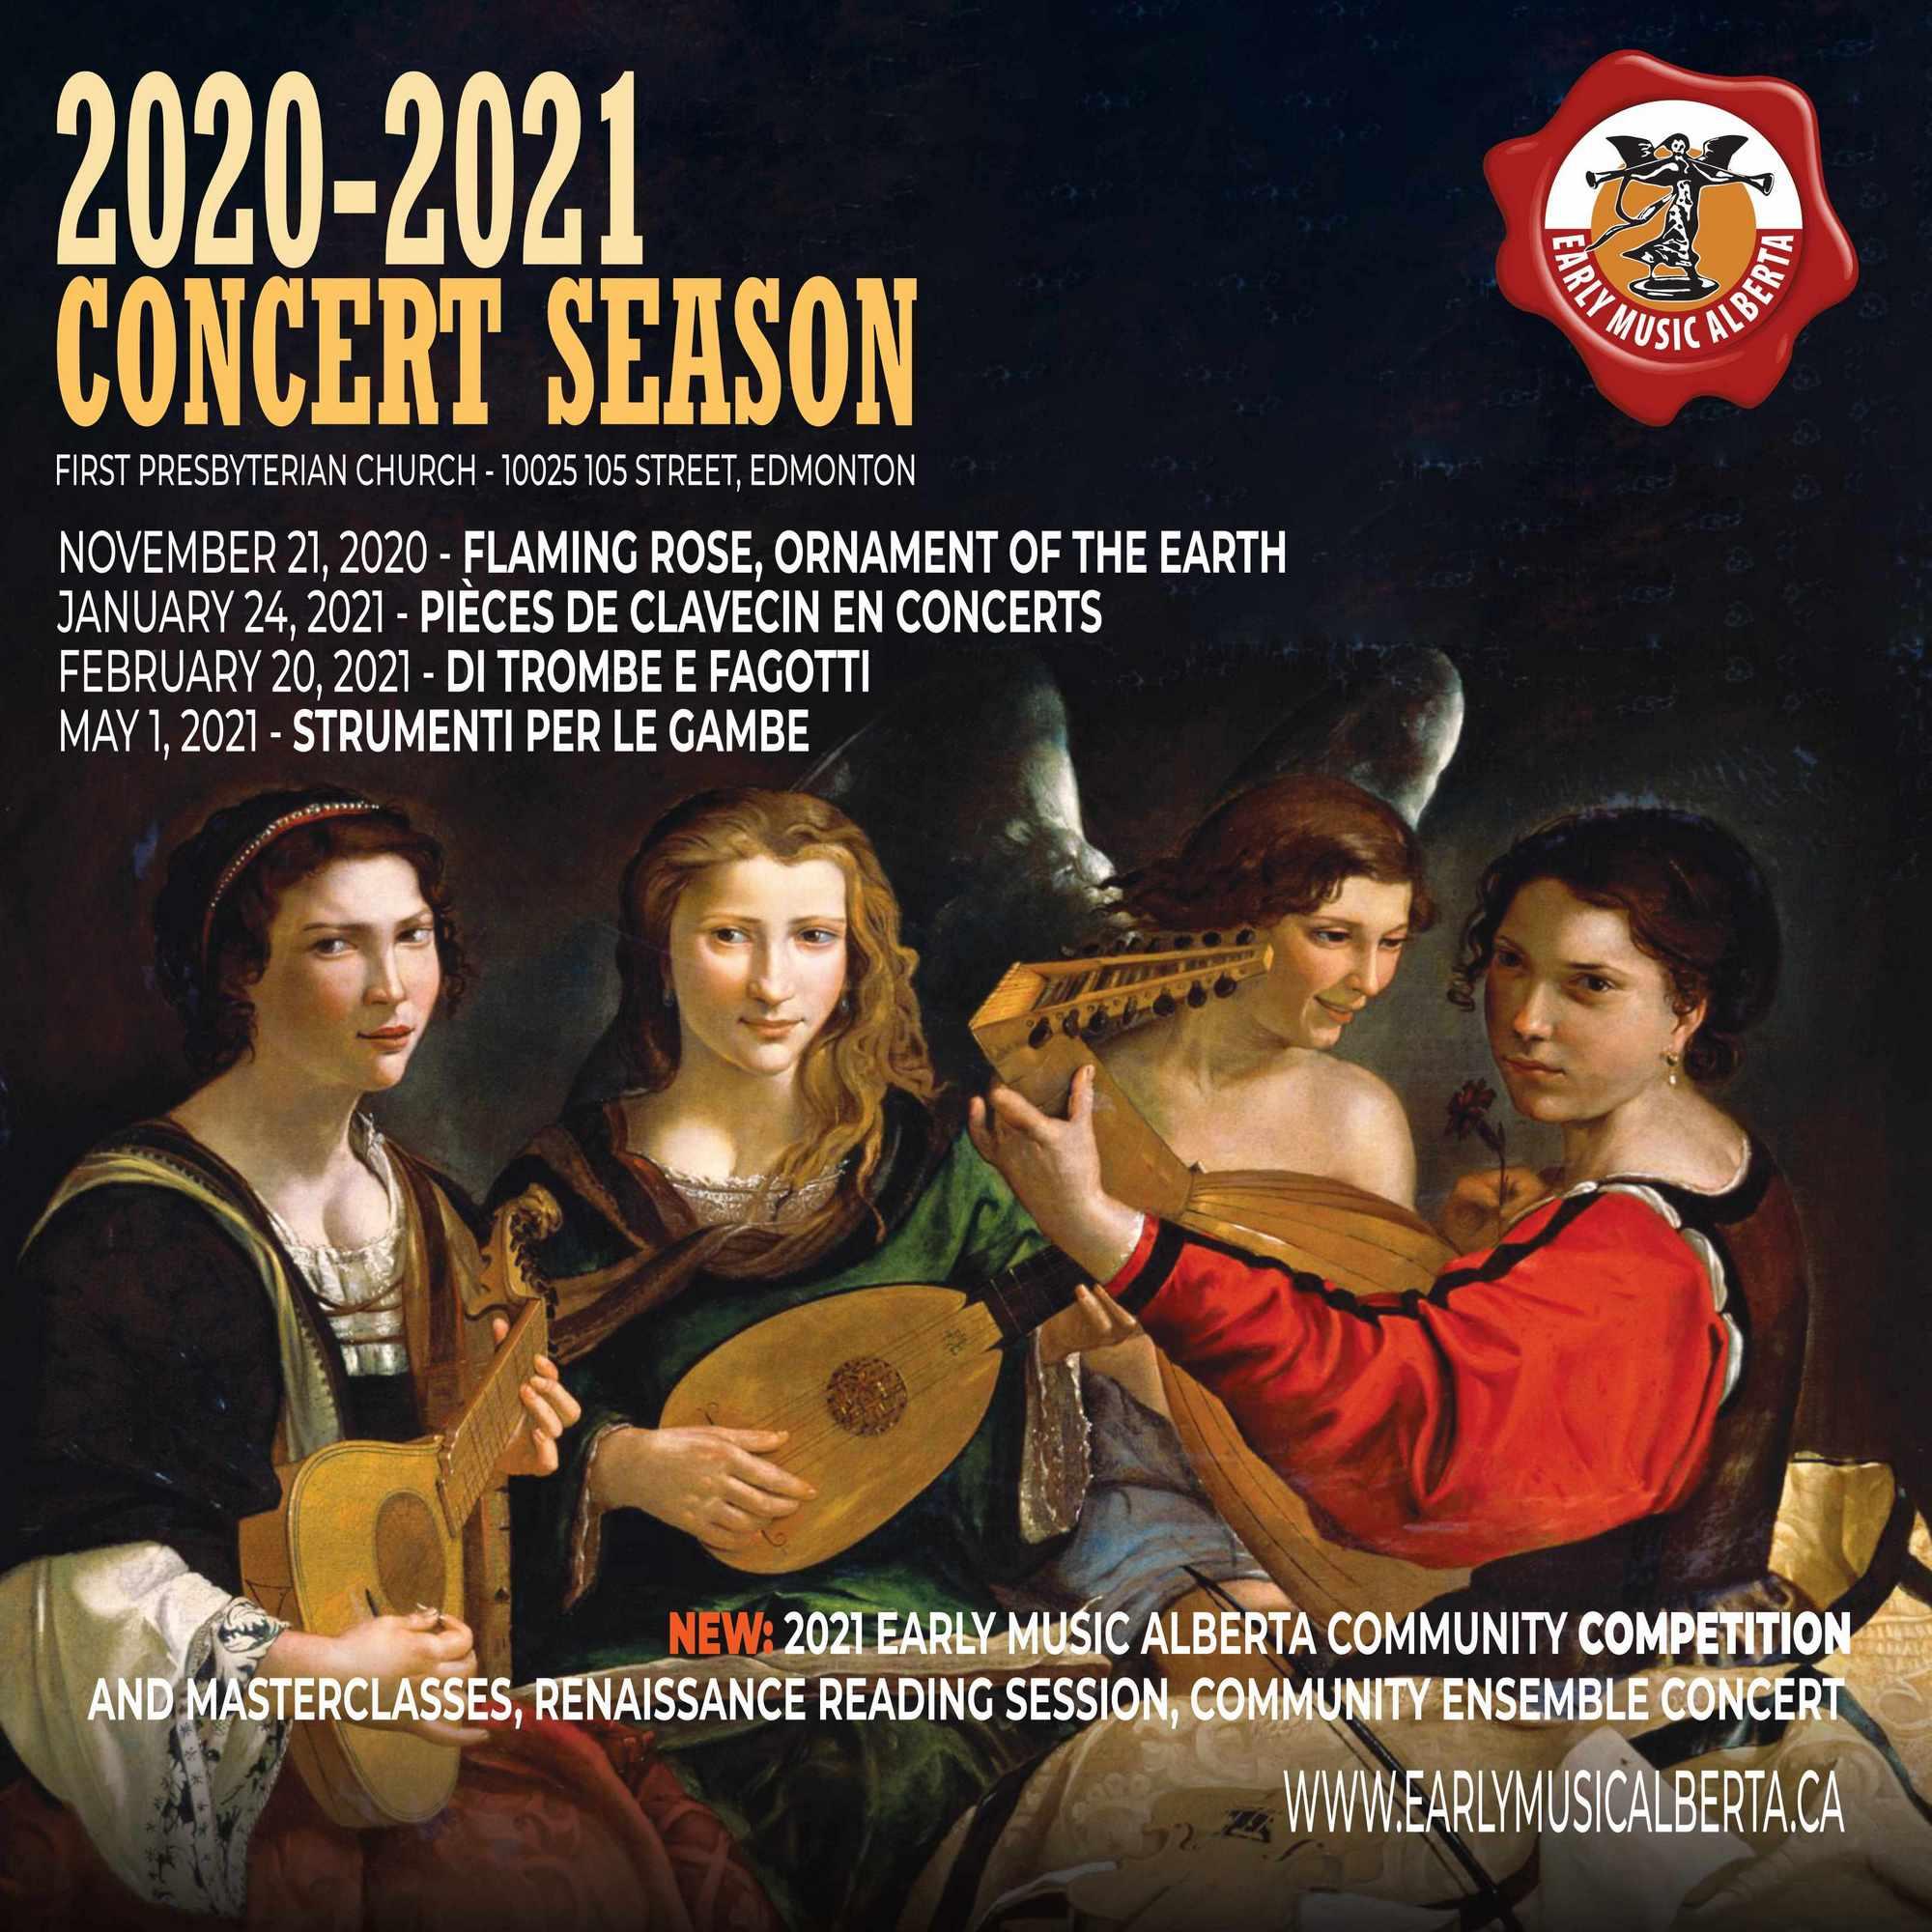 Concert SEASON 2020-2021